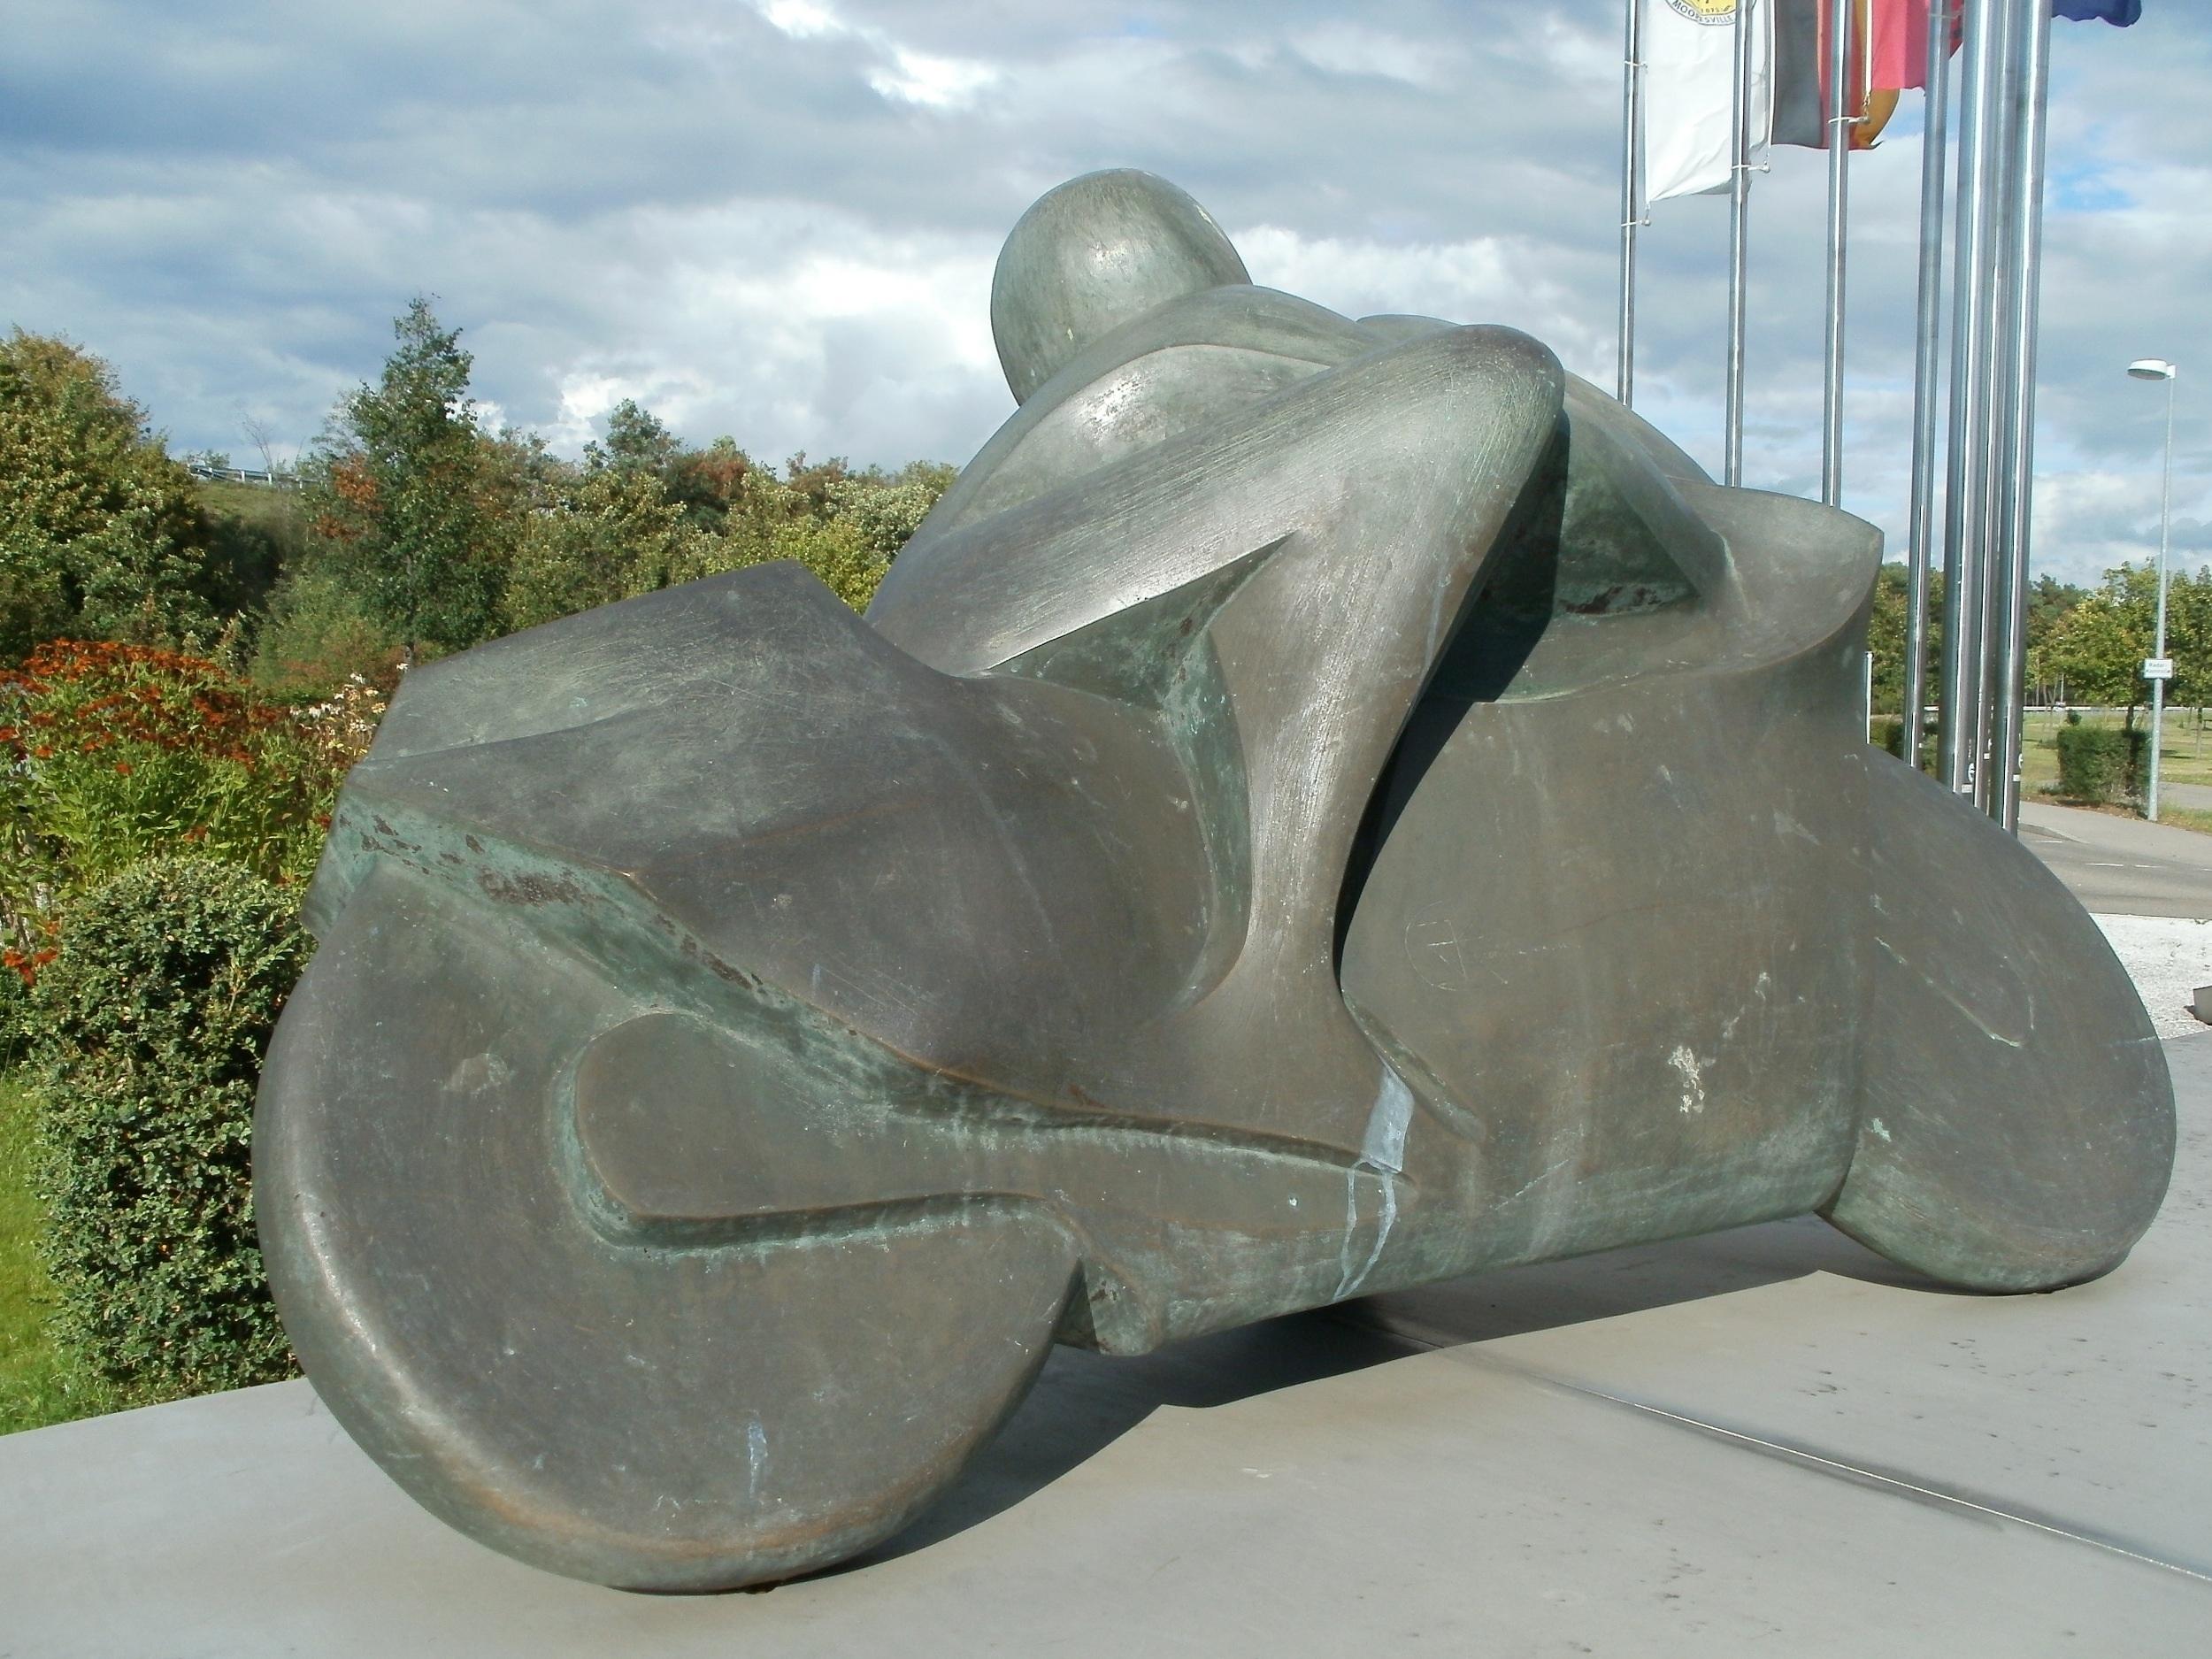 Immagini belle roccia bicicletta monumento ciclista - Sculpture exterieure metal ...